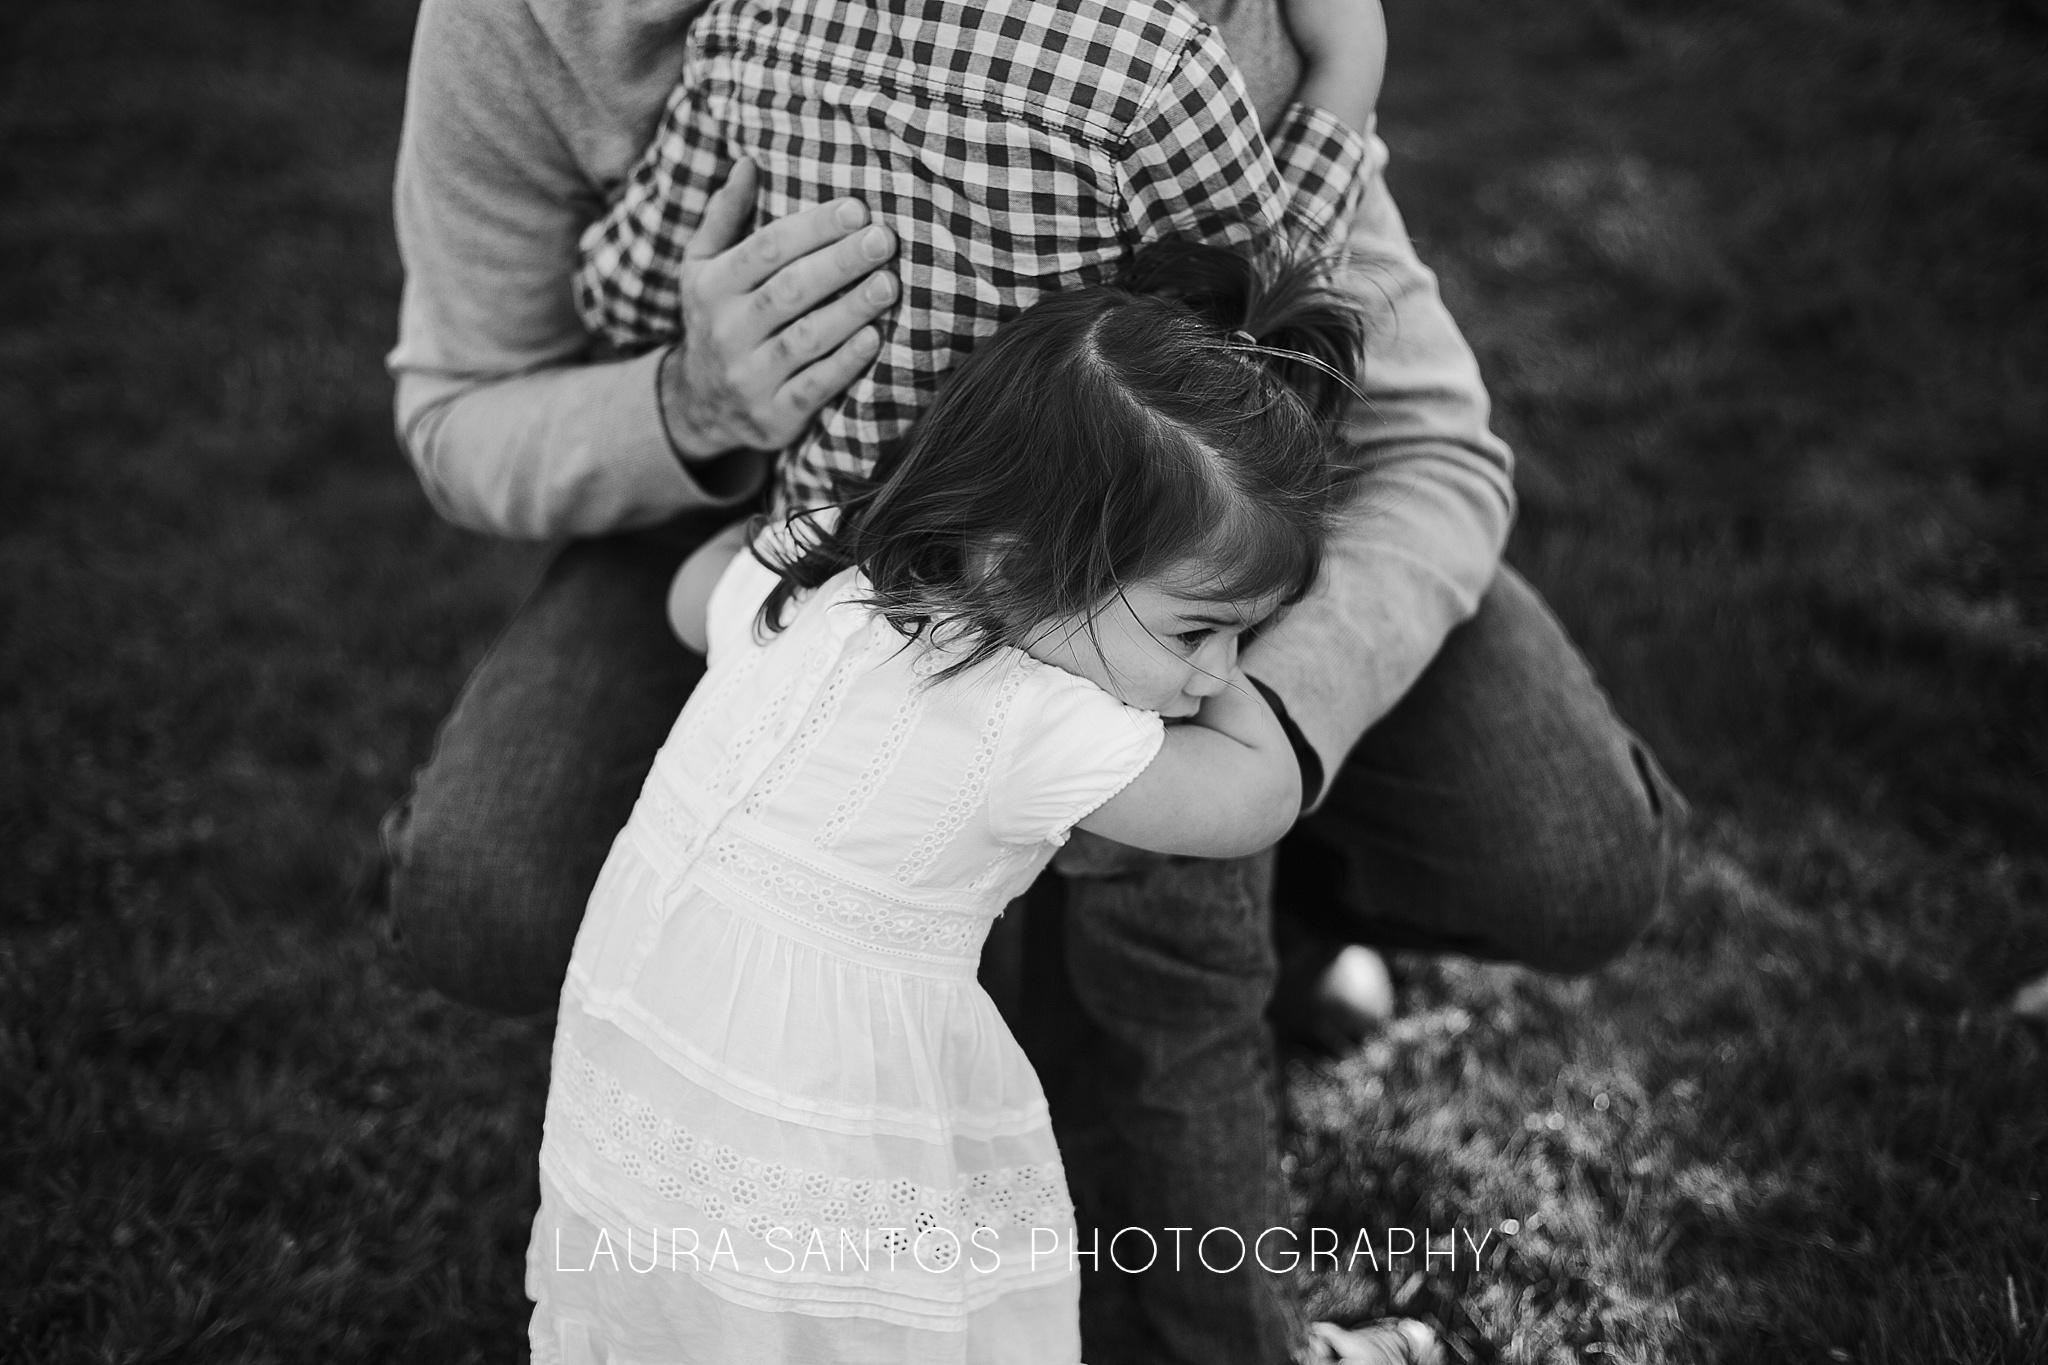 Laura Santos Photography Portland Oregon Family Photographer_0831.jpg